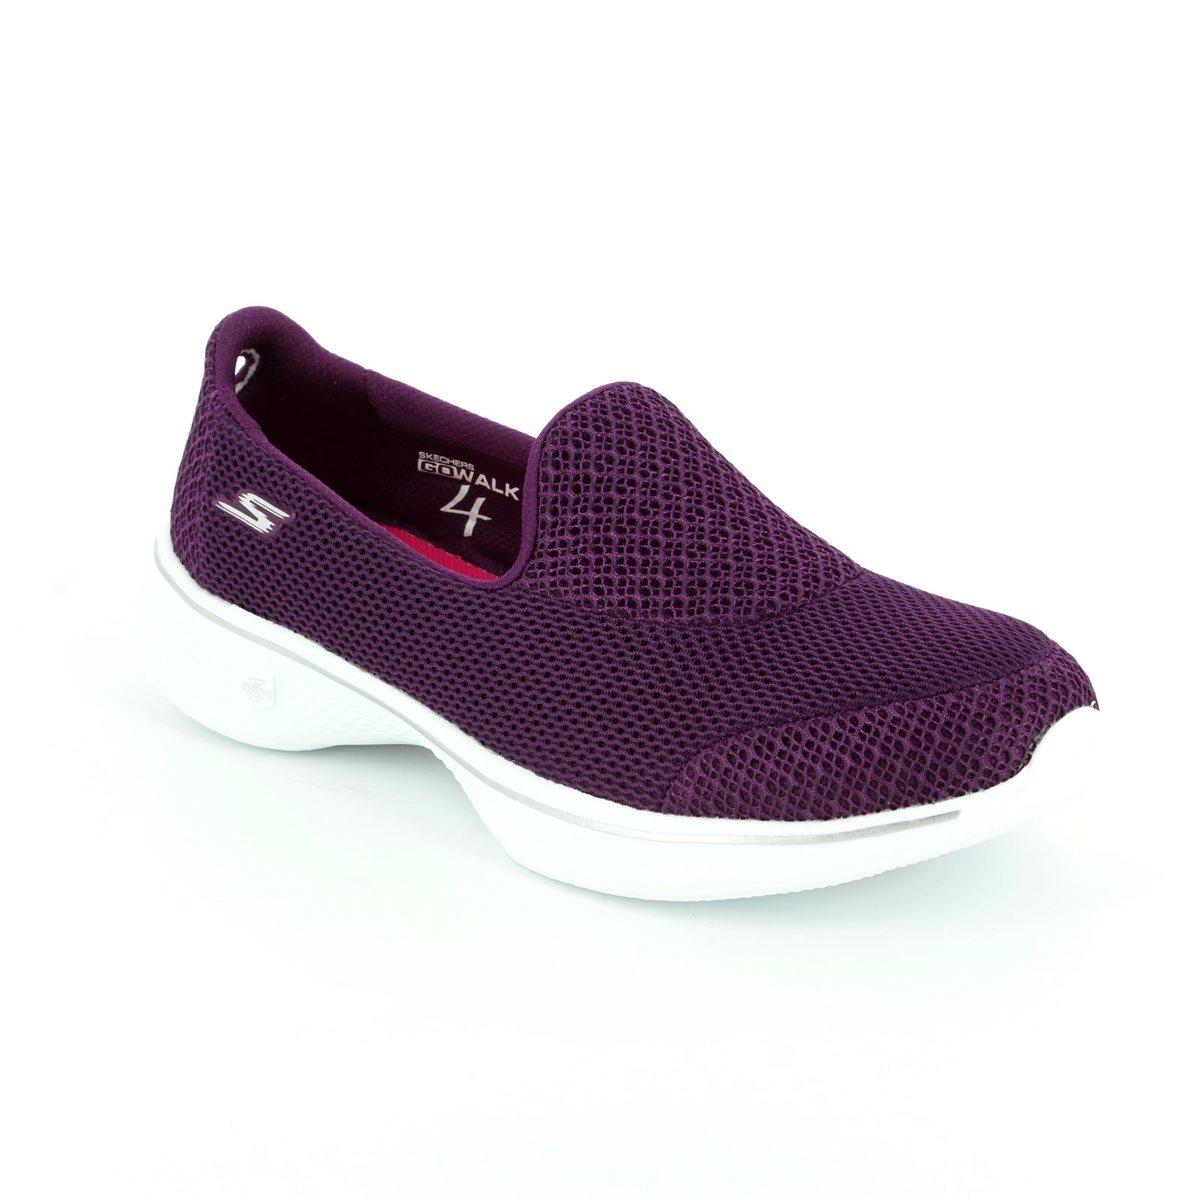 Ras Shoes Uk